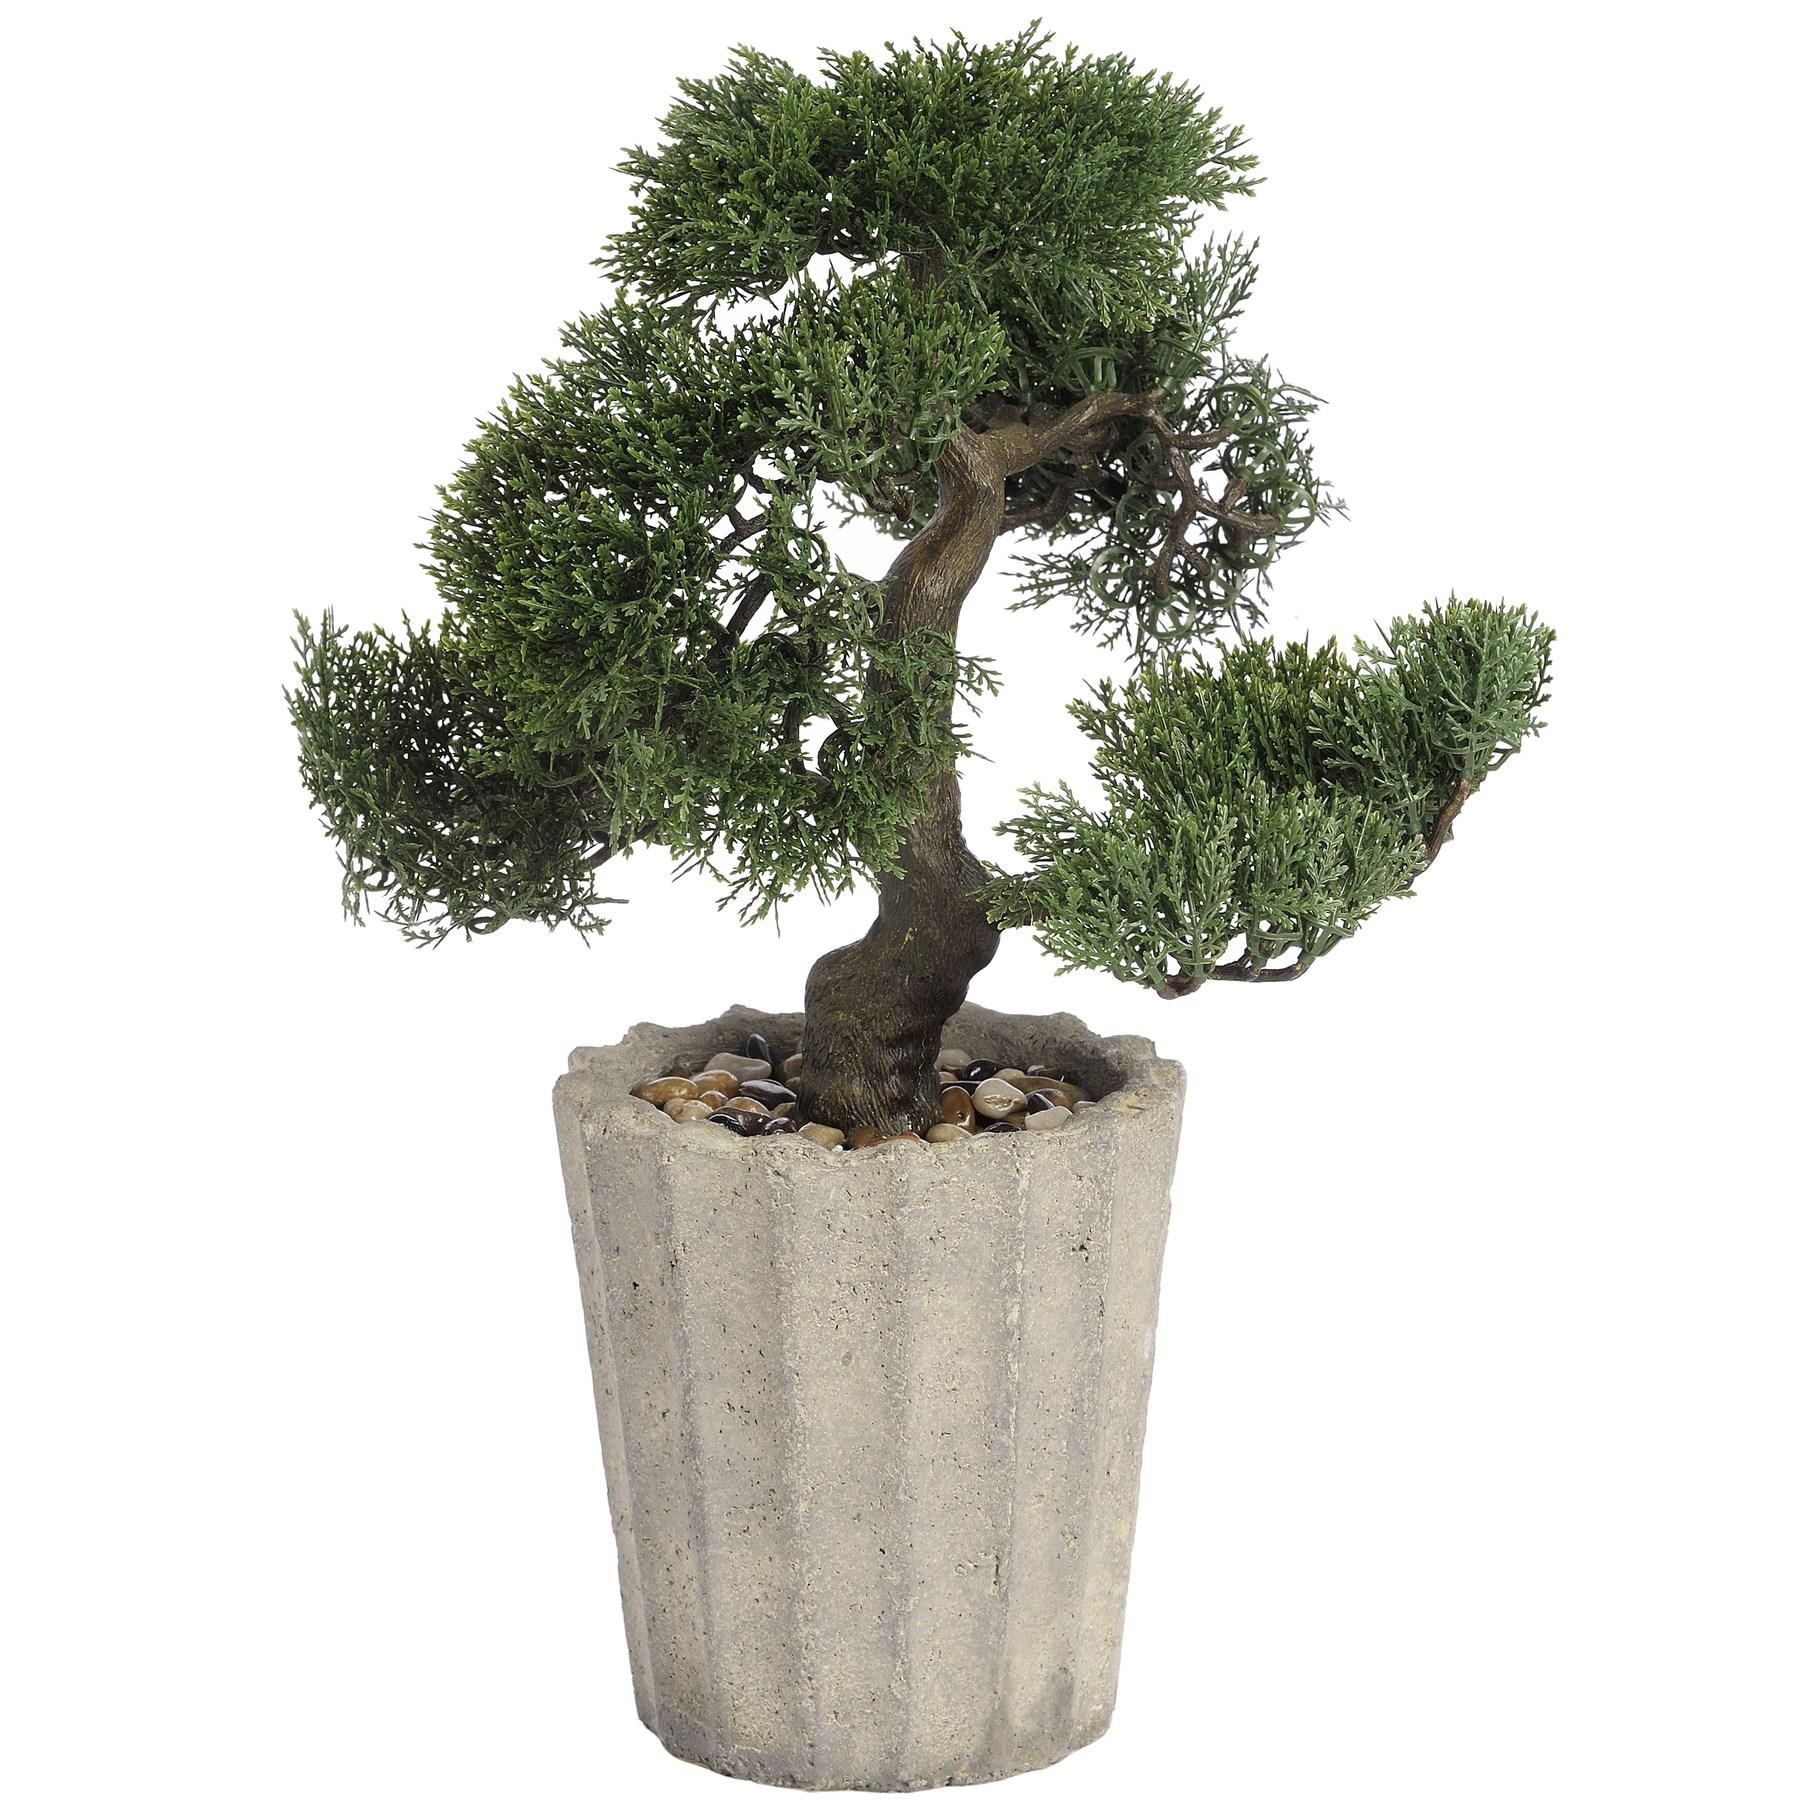 hill interiors k nstlicher bonsai baum im topf ebay. Black Bedroom Furniture Sets. Home Design Ideas